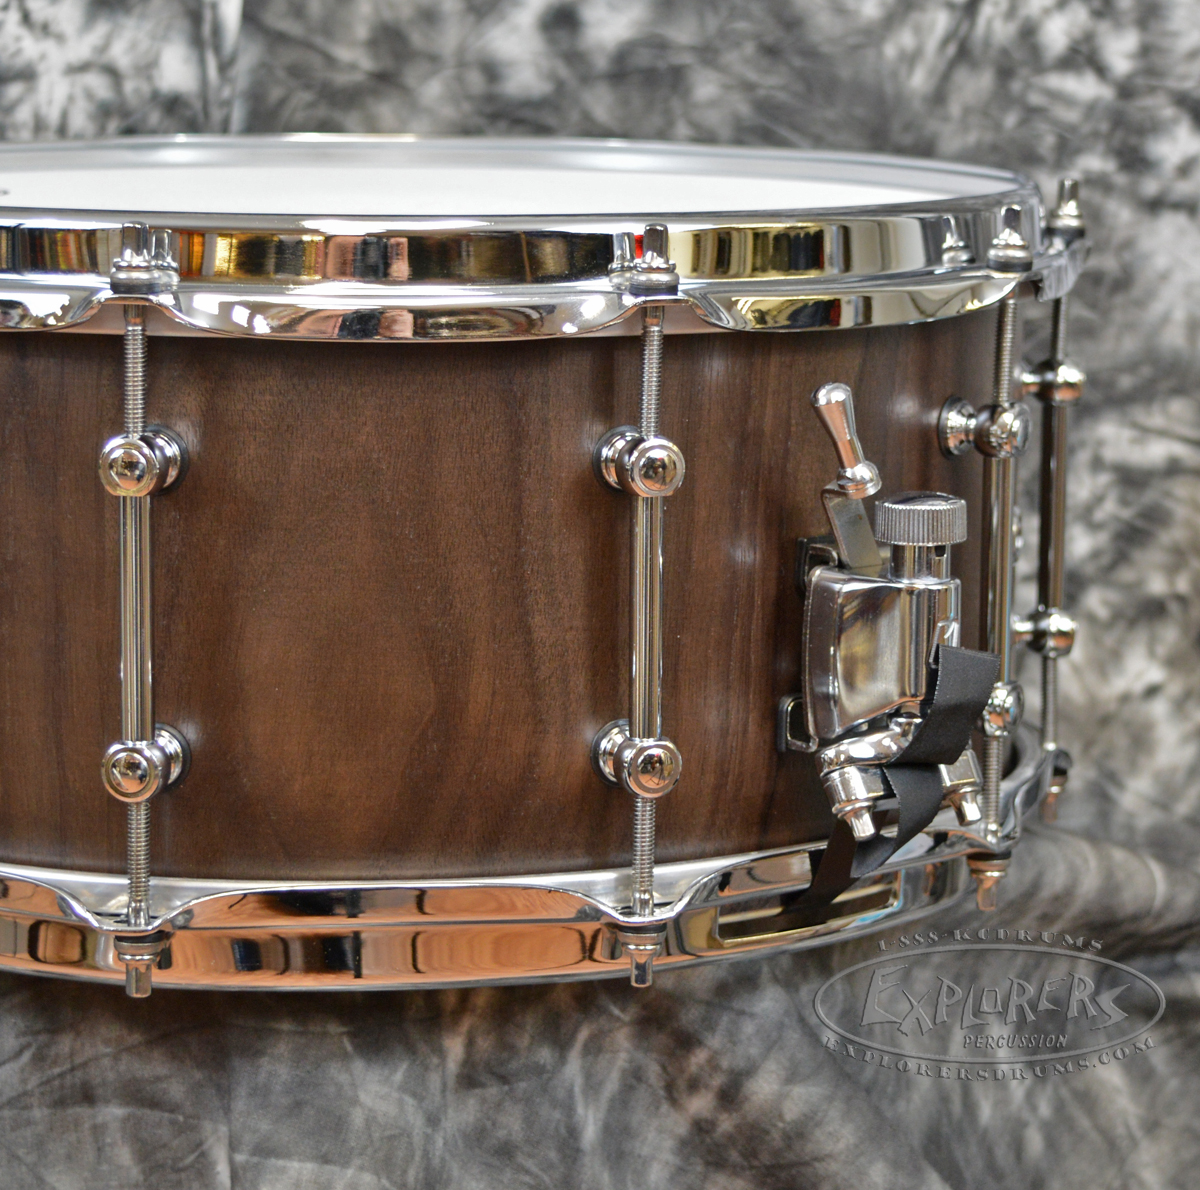 tama slp series g walnut 6 5 x 14 snare drum. Black Bedroom Furniture Sets. Home Design Ideas